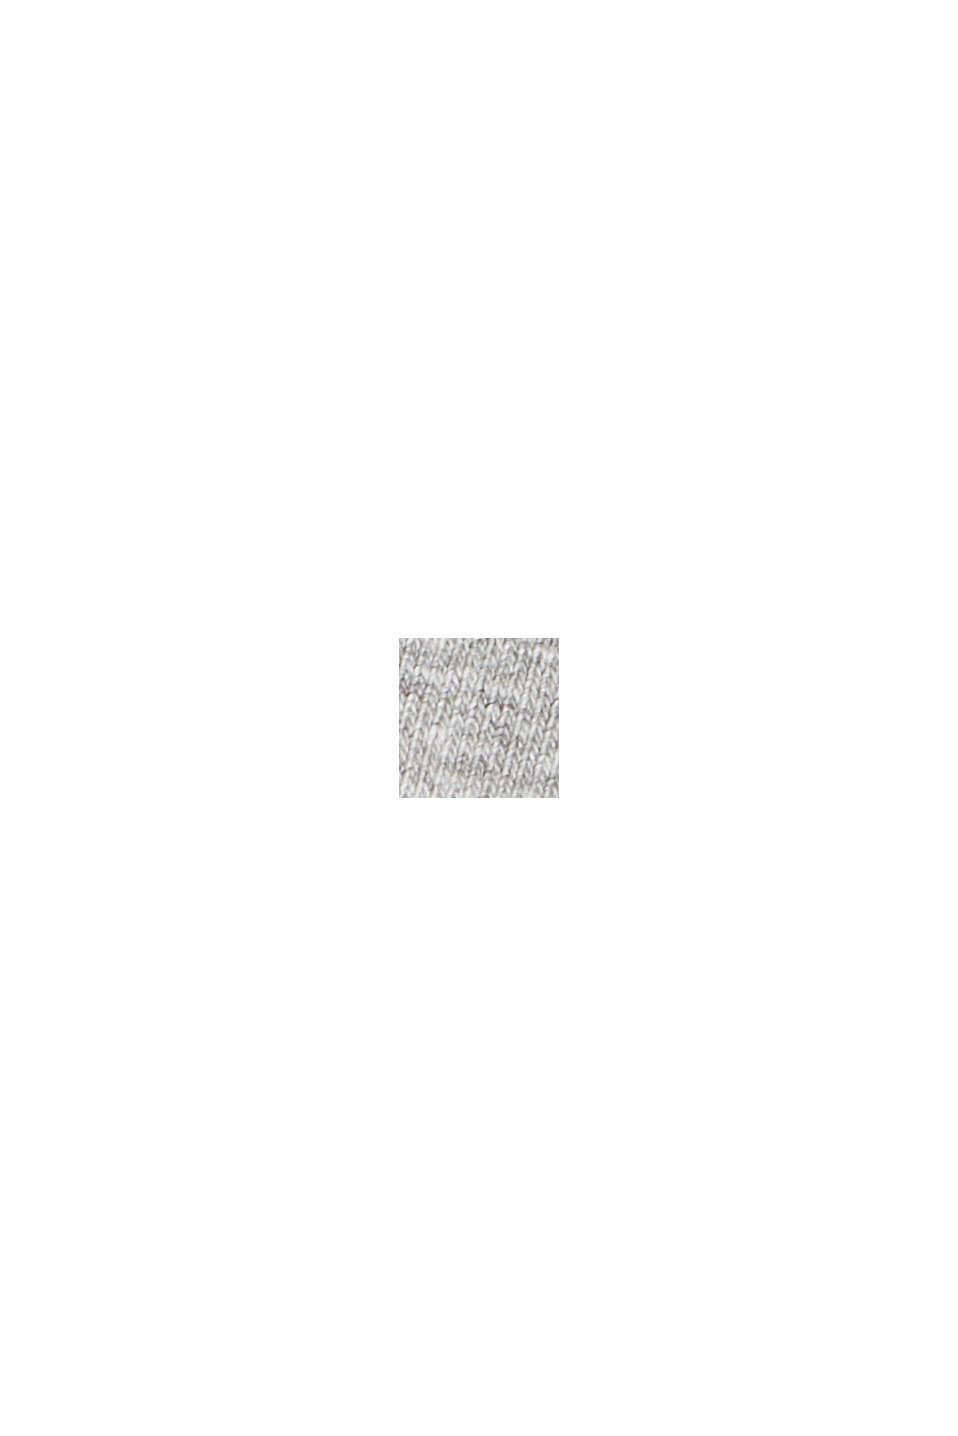 Sweat-shirt à col zippé en coton mélangé, MEDIUM GREY, swatch